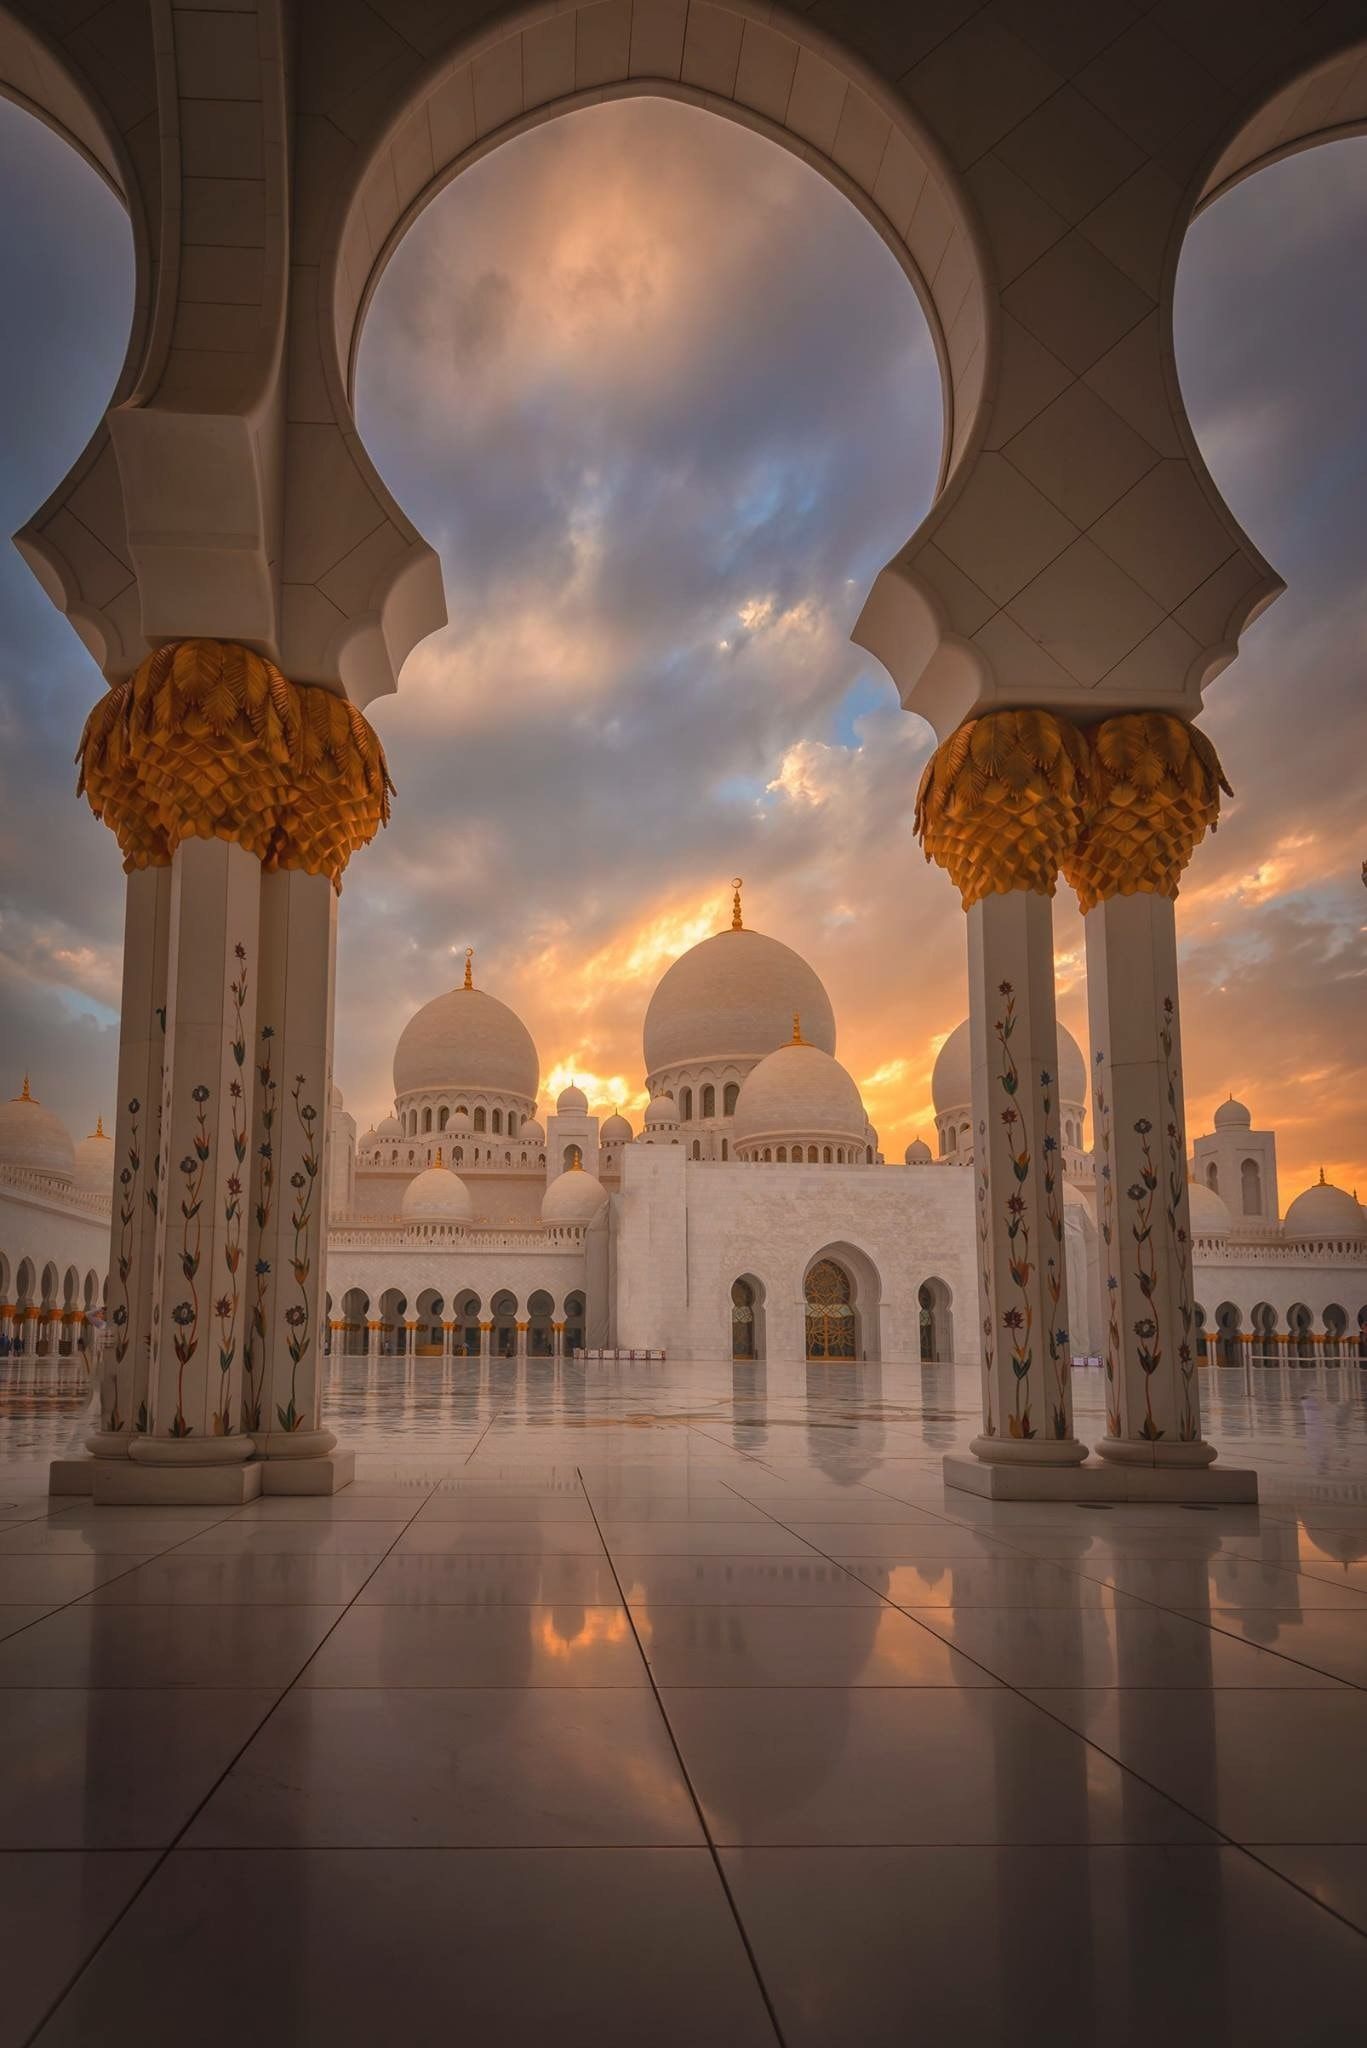 arte islmico pintura autores islamic wallpaper aesthetic